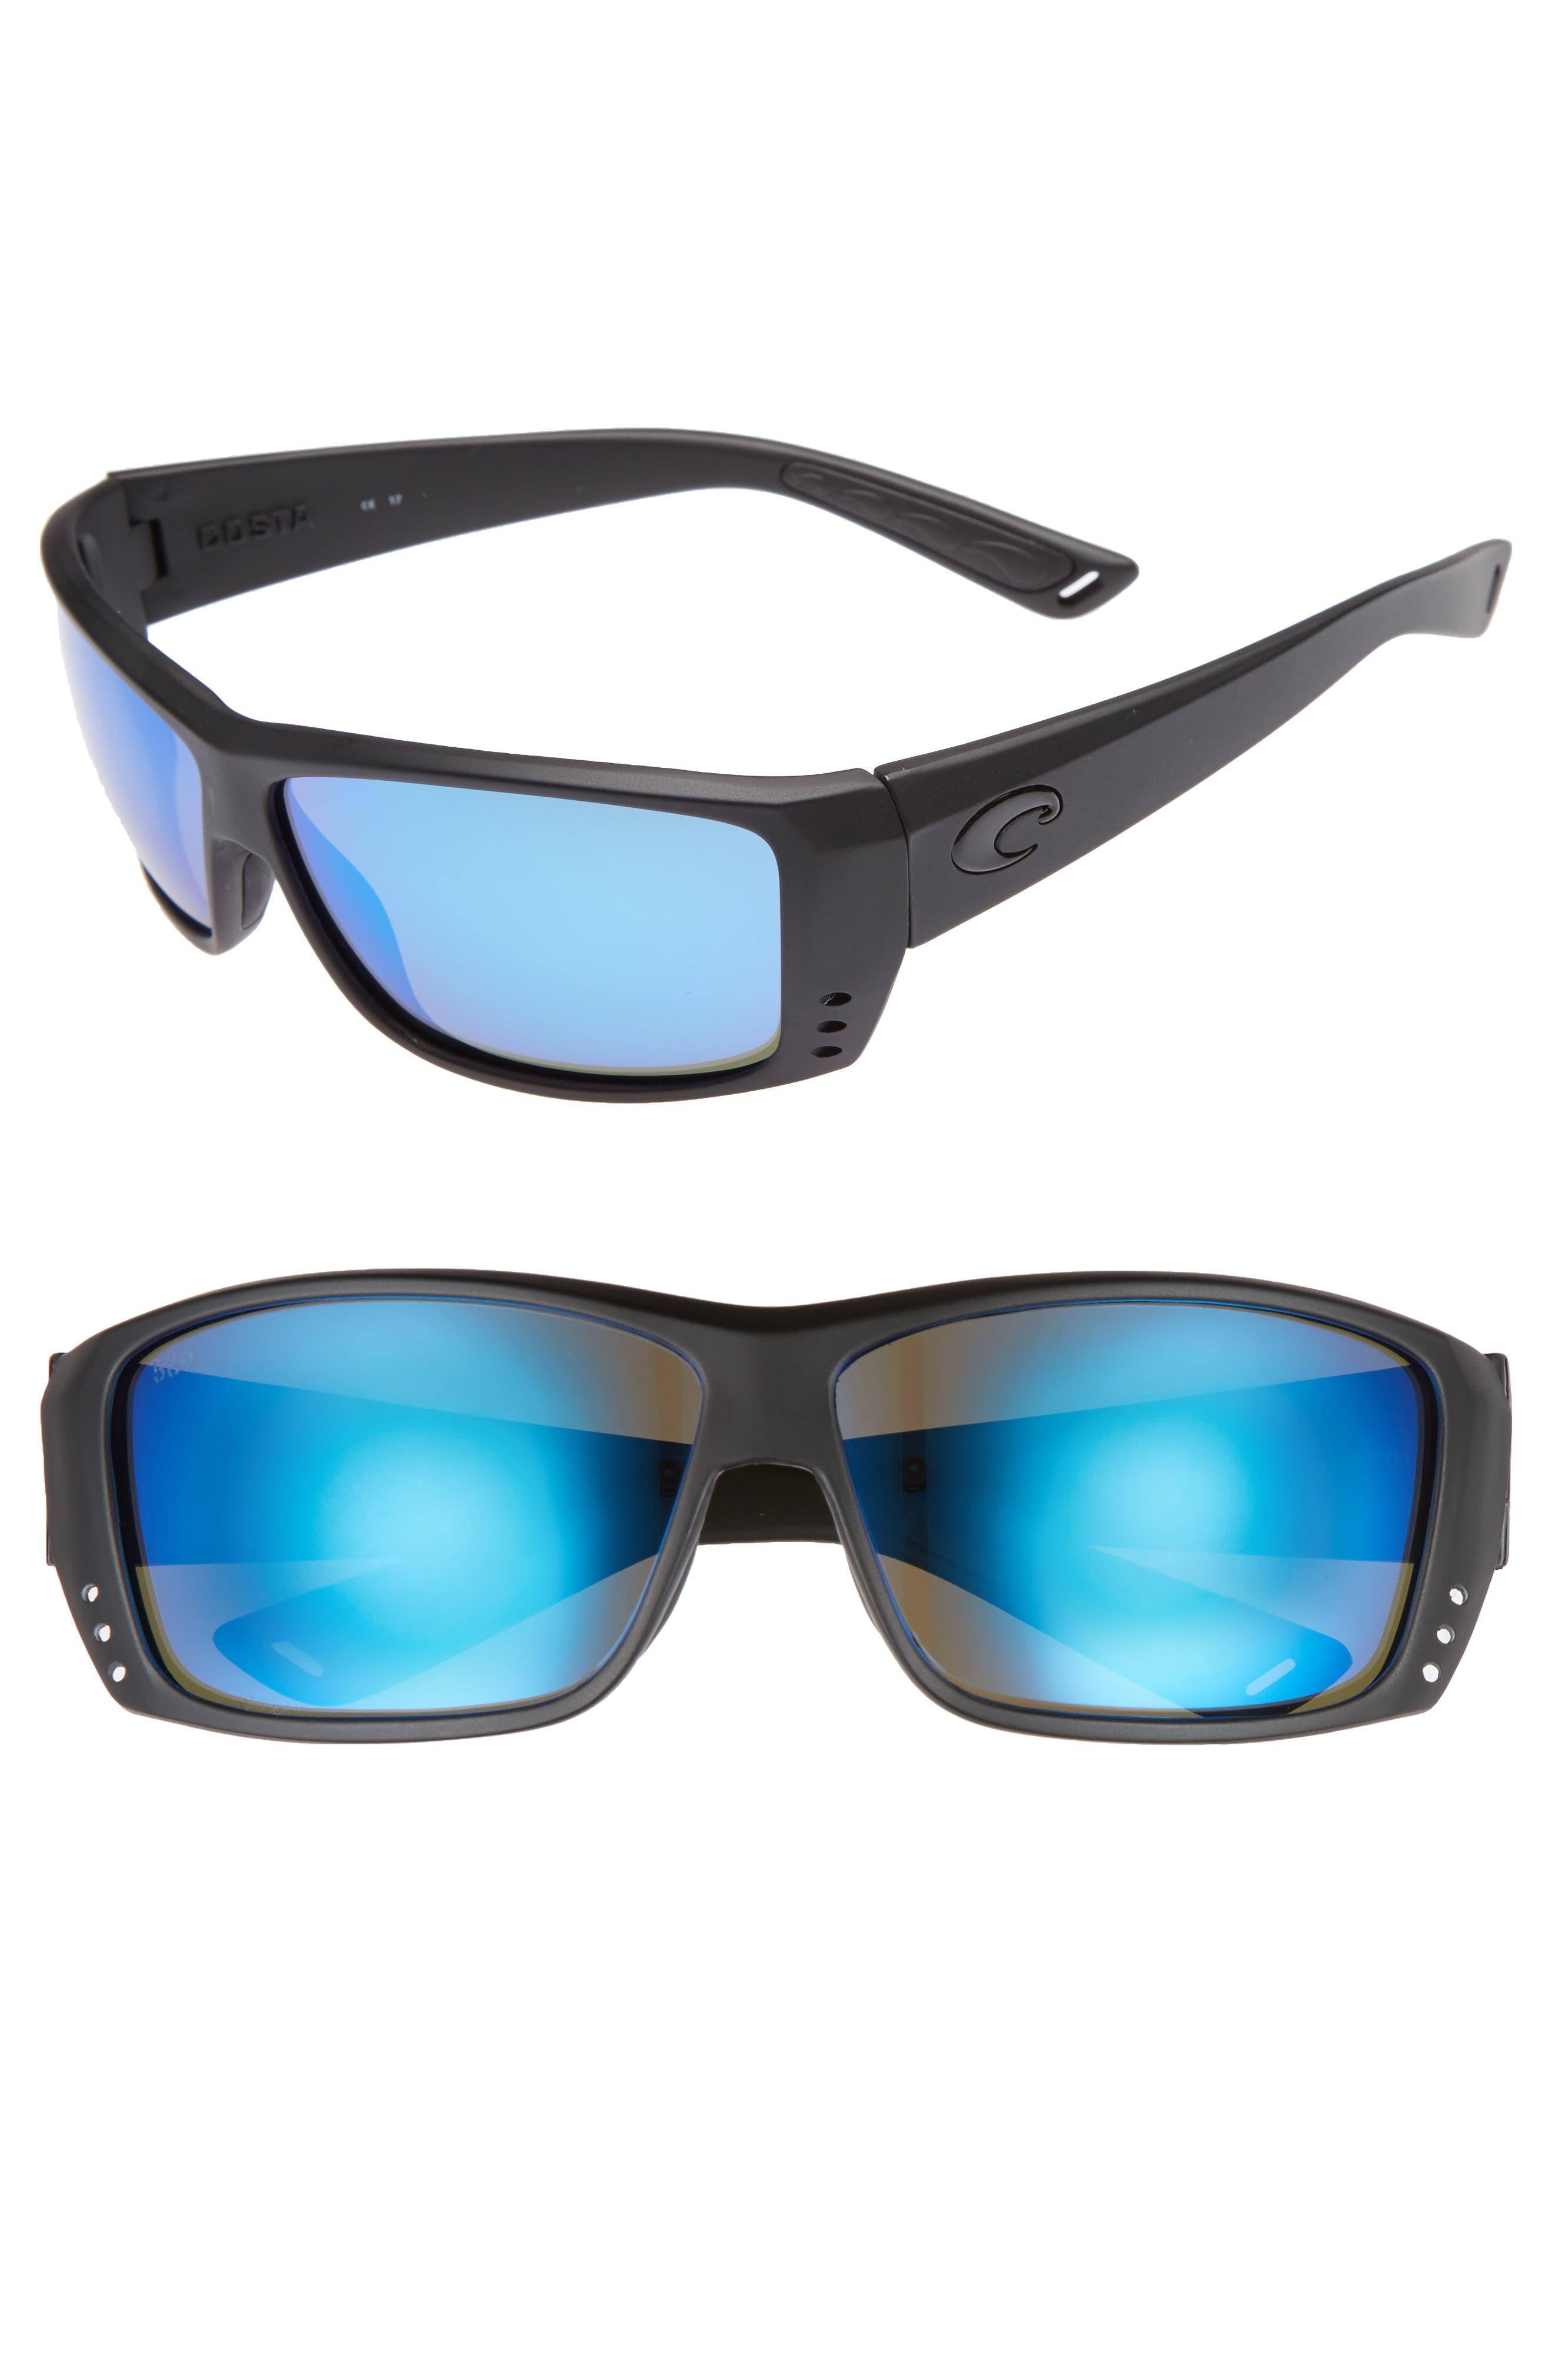 Cat Cay 60mm Polarized Sunglasses,                             Main thumbnail 1, color,                             BLACKOUT/ BLUE MIRROR